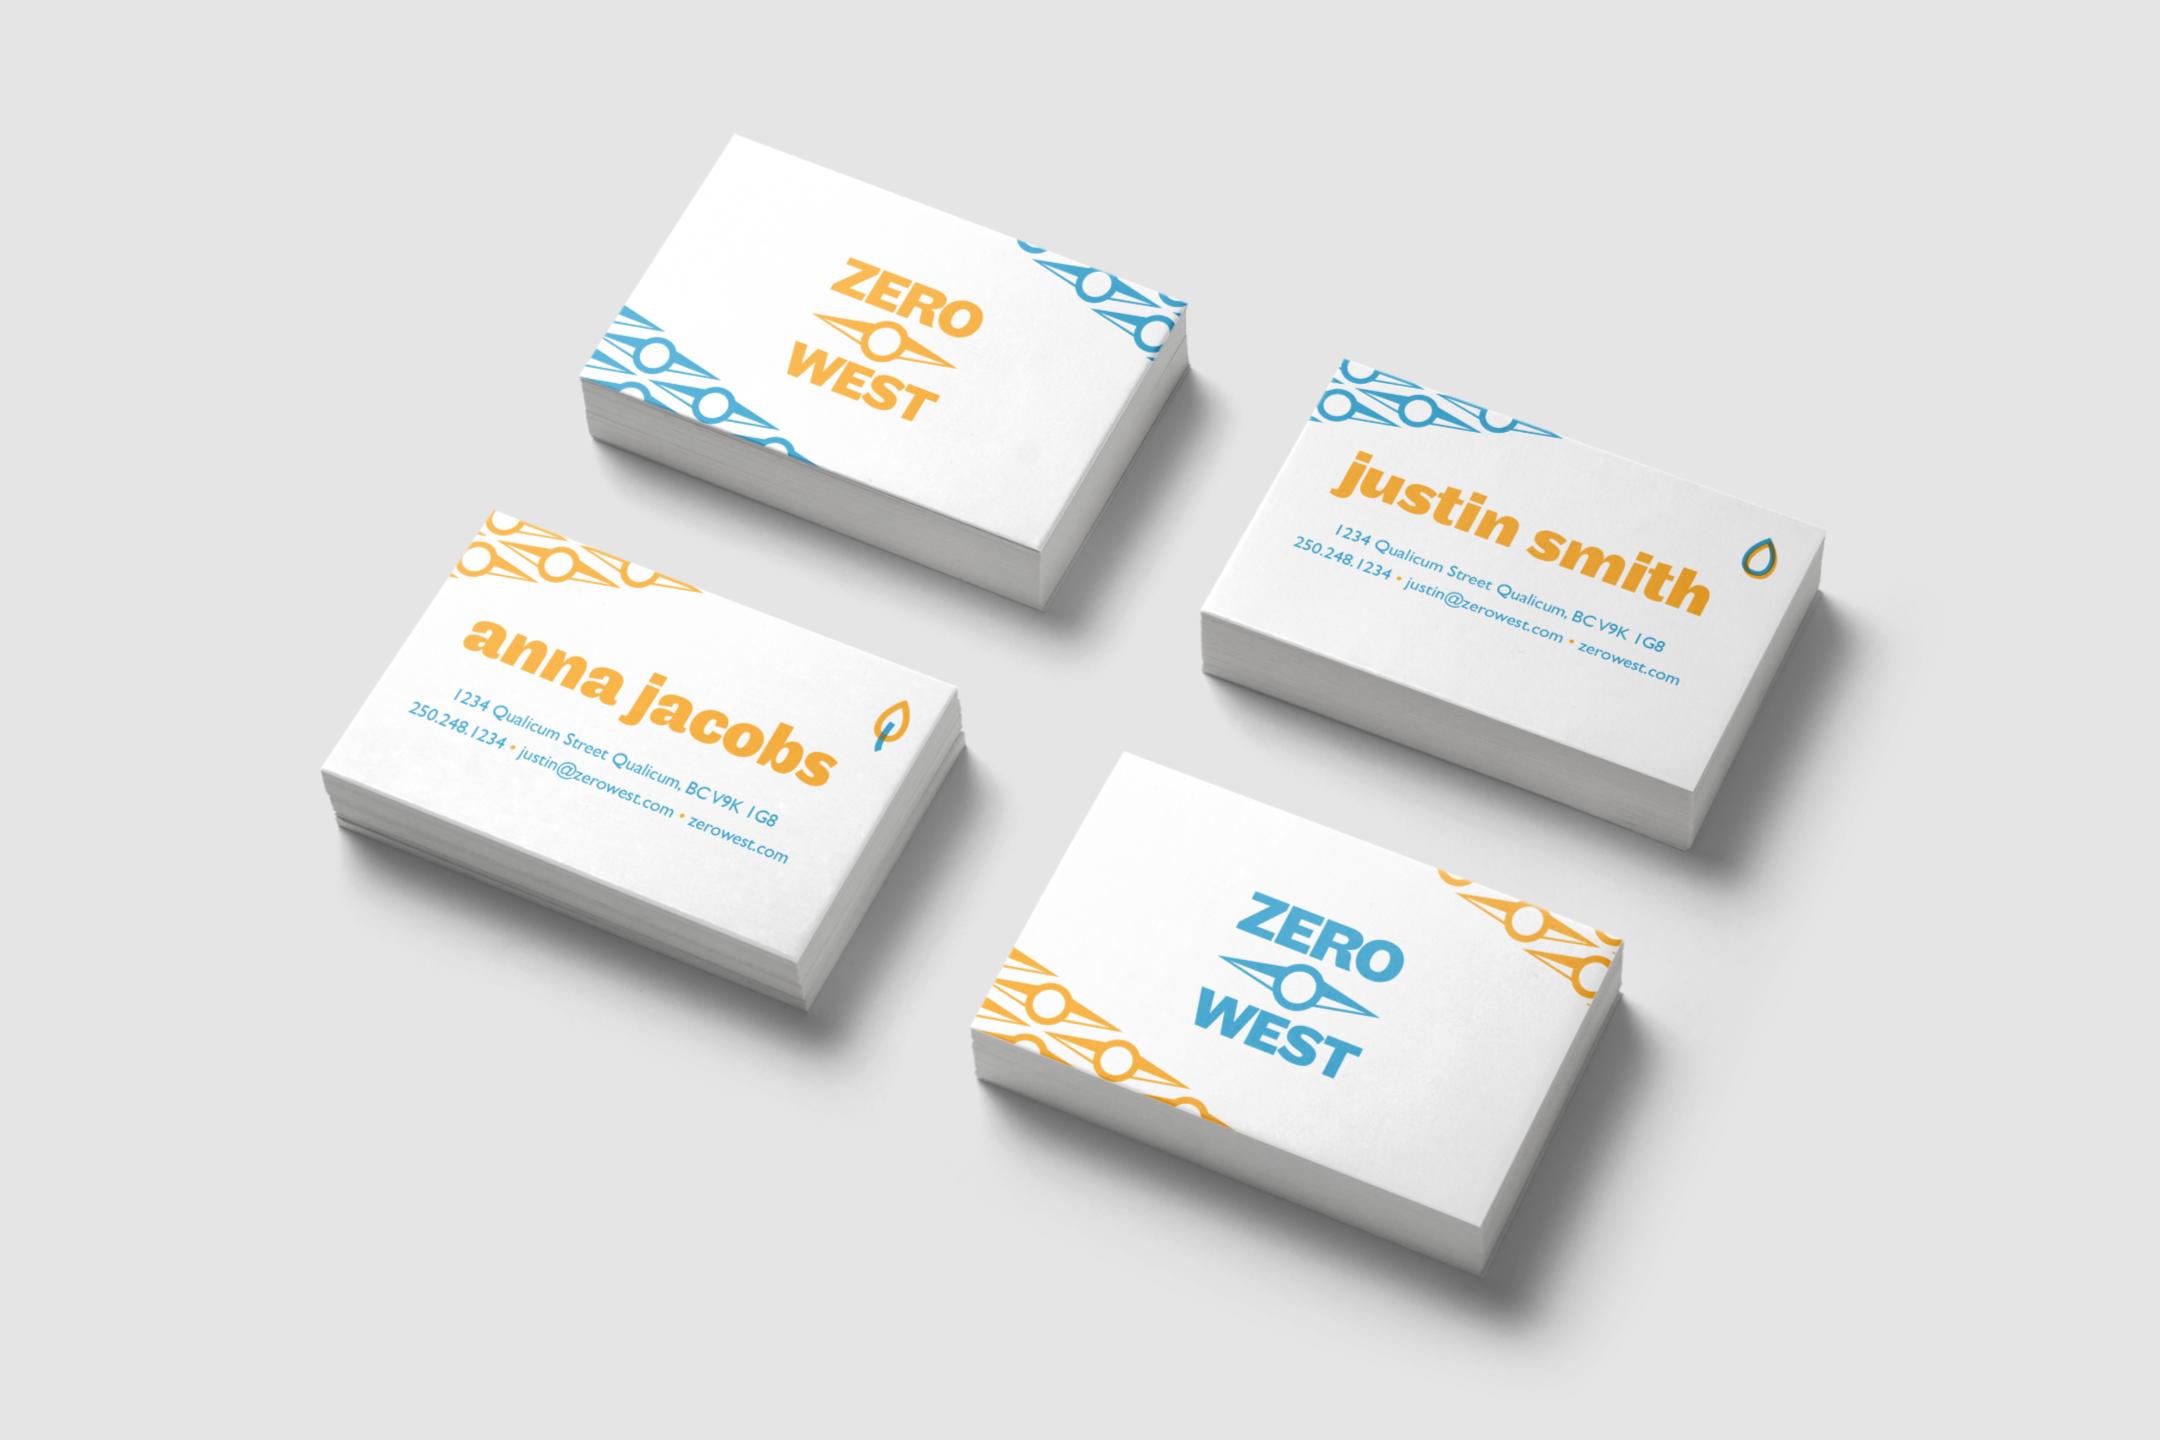 Zero West: Business Card Design